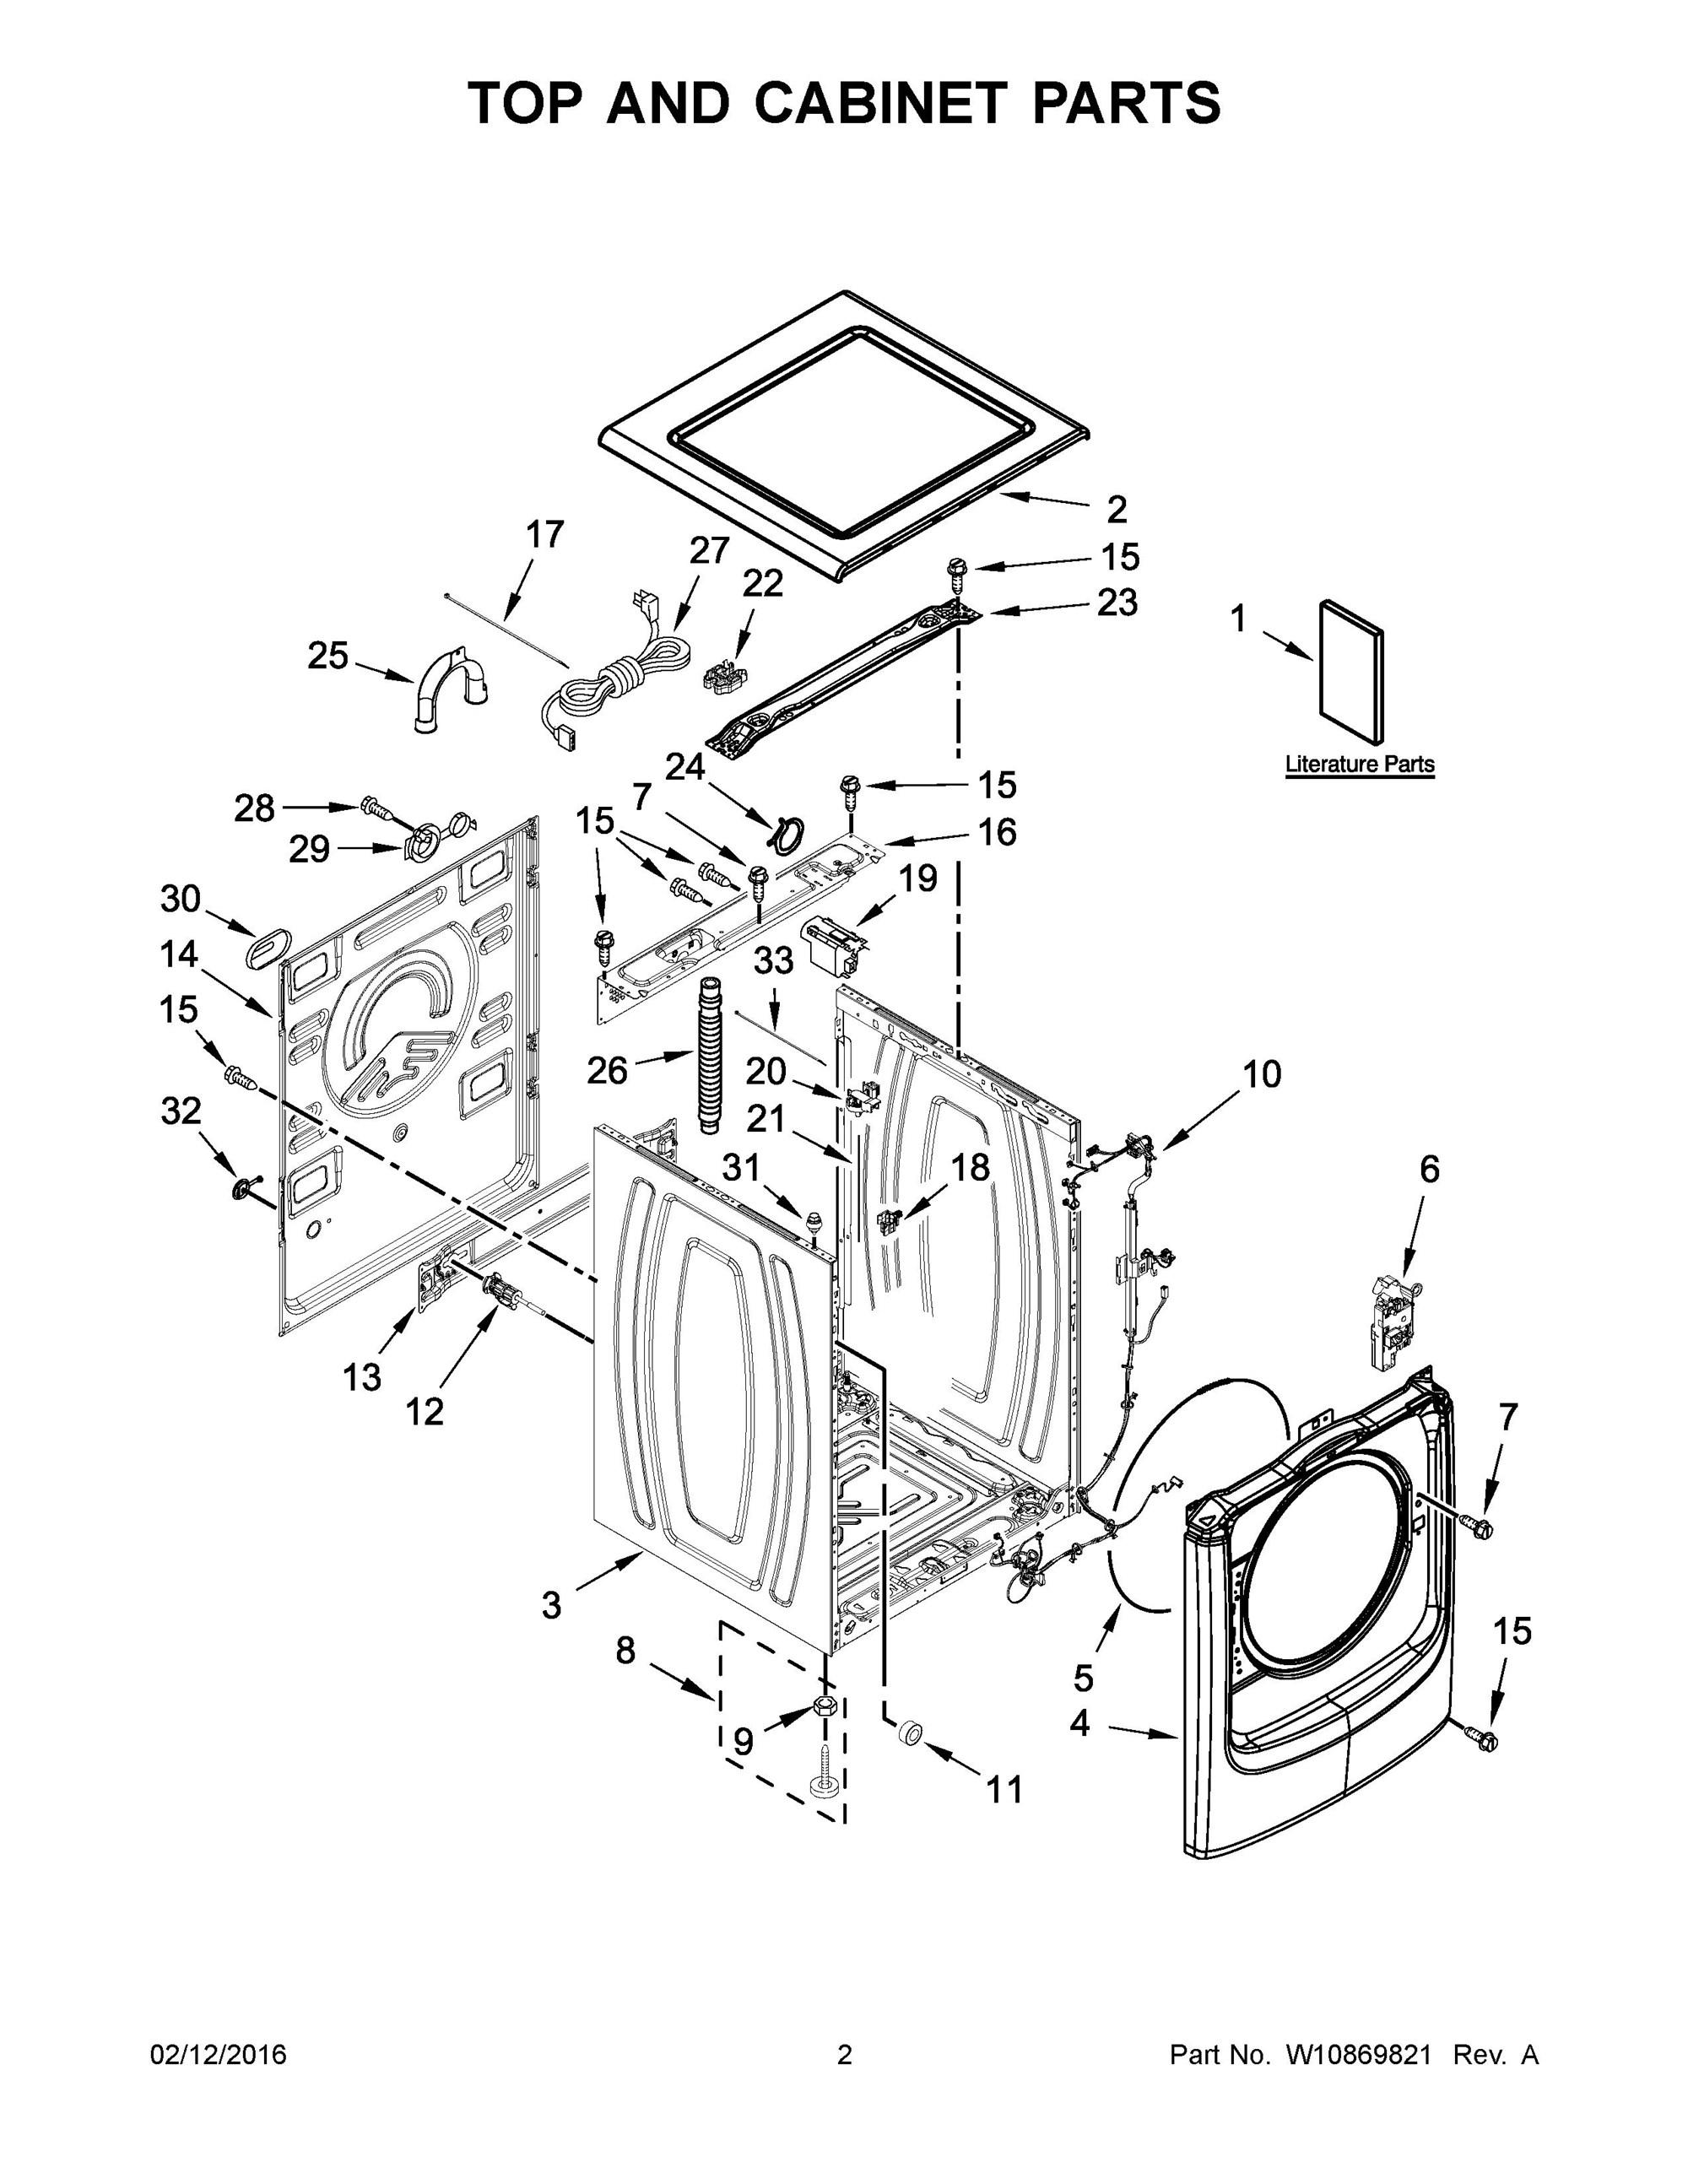 whirlpool trash compactor wiring diagram trash compactor